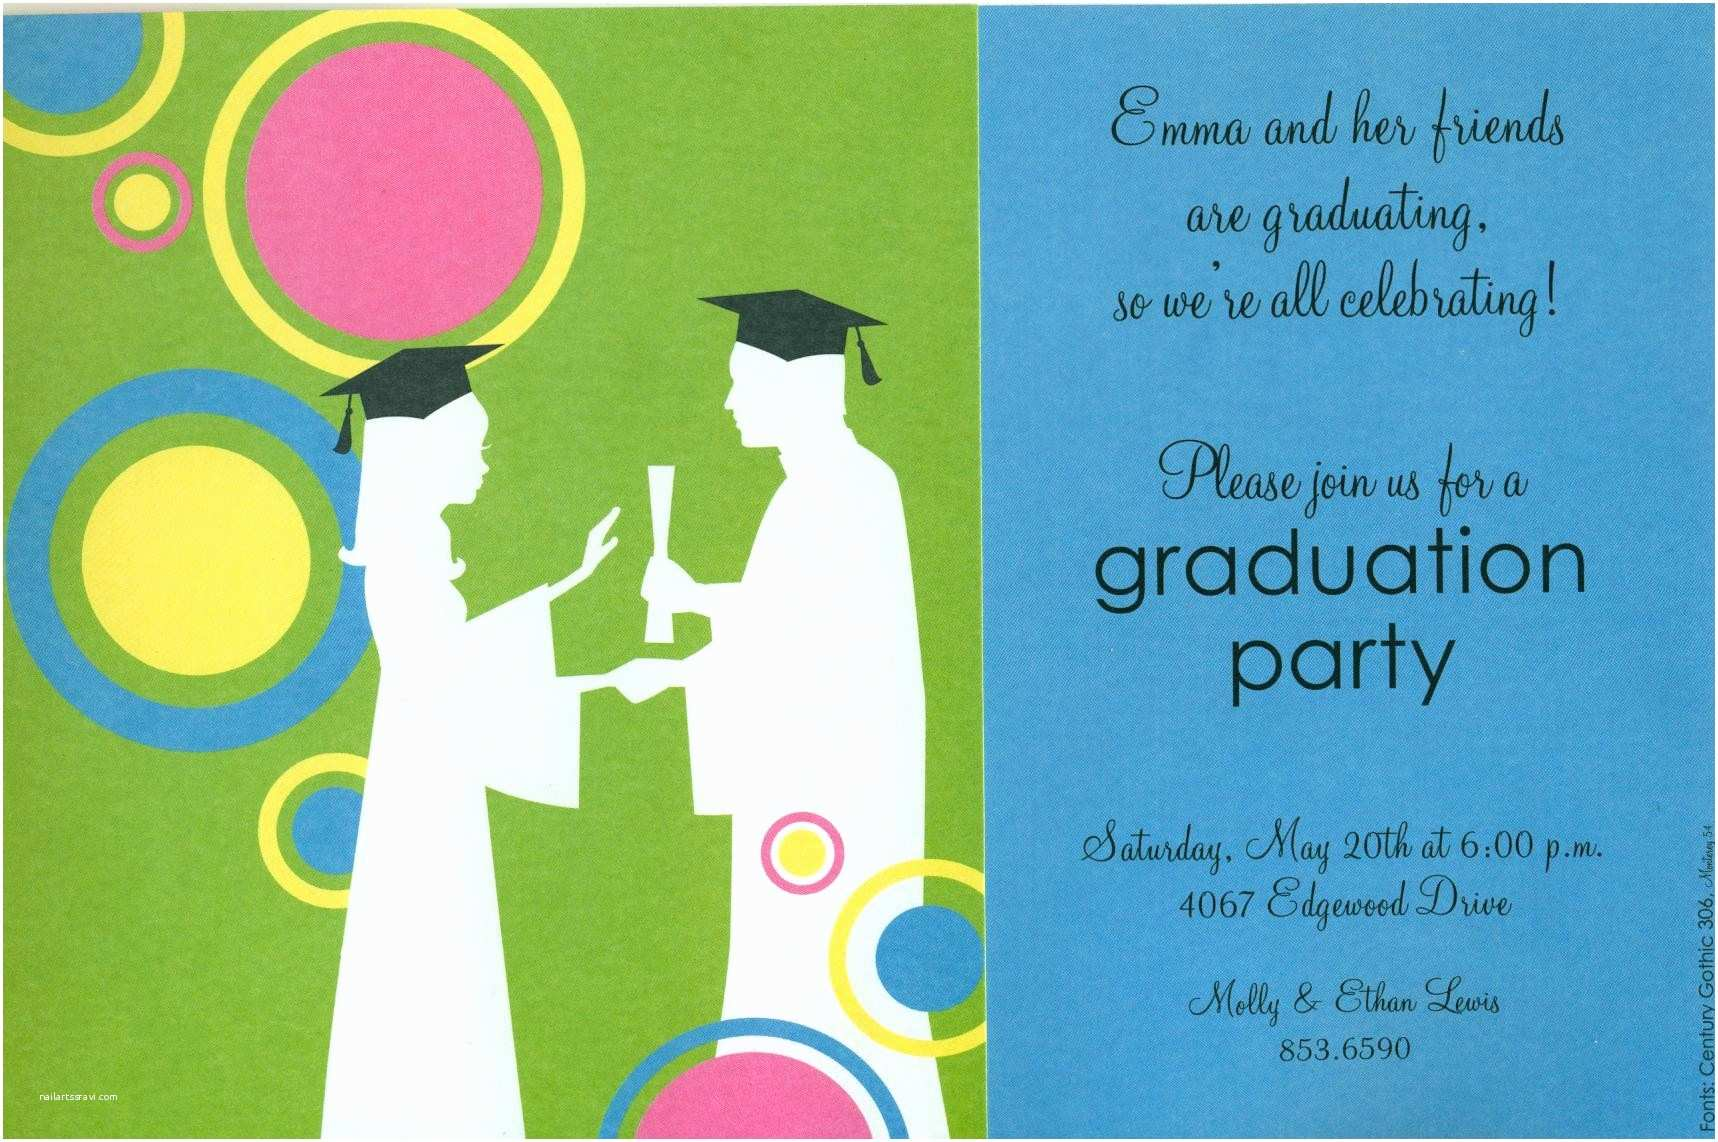 Graduation Party Invitation Wording Graduation Party Invitation Wording Templates